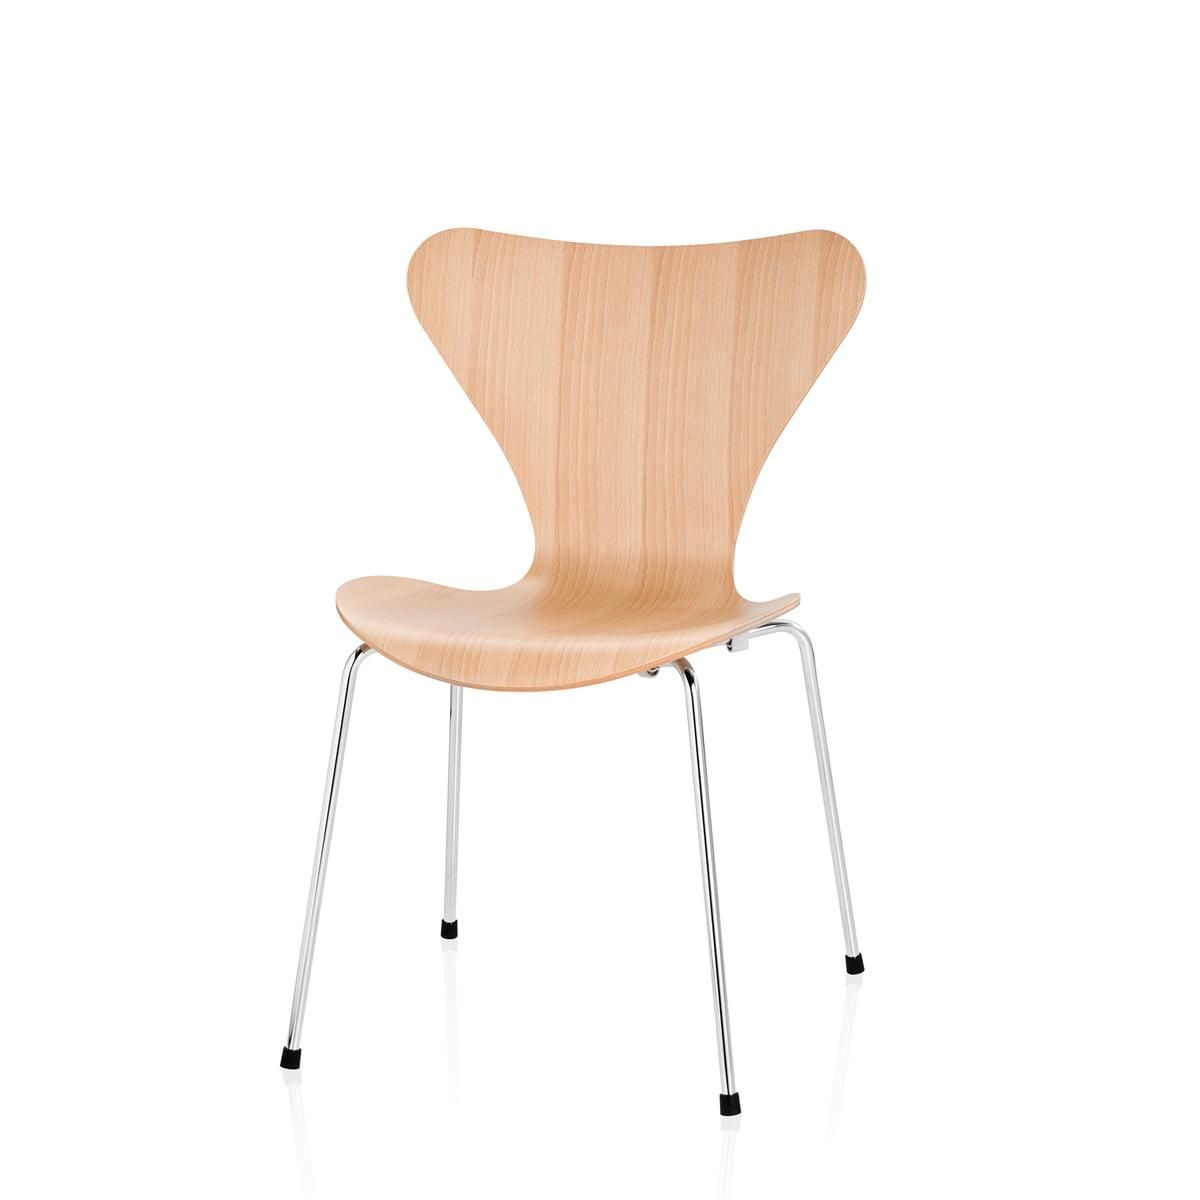 serie 7 barnestol fritz hansen shop. Black Bedroom Furniture Sets. Home Design Ideas